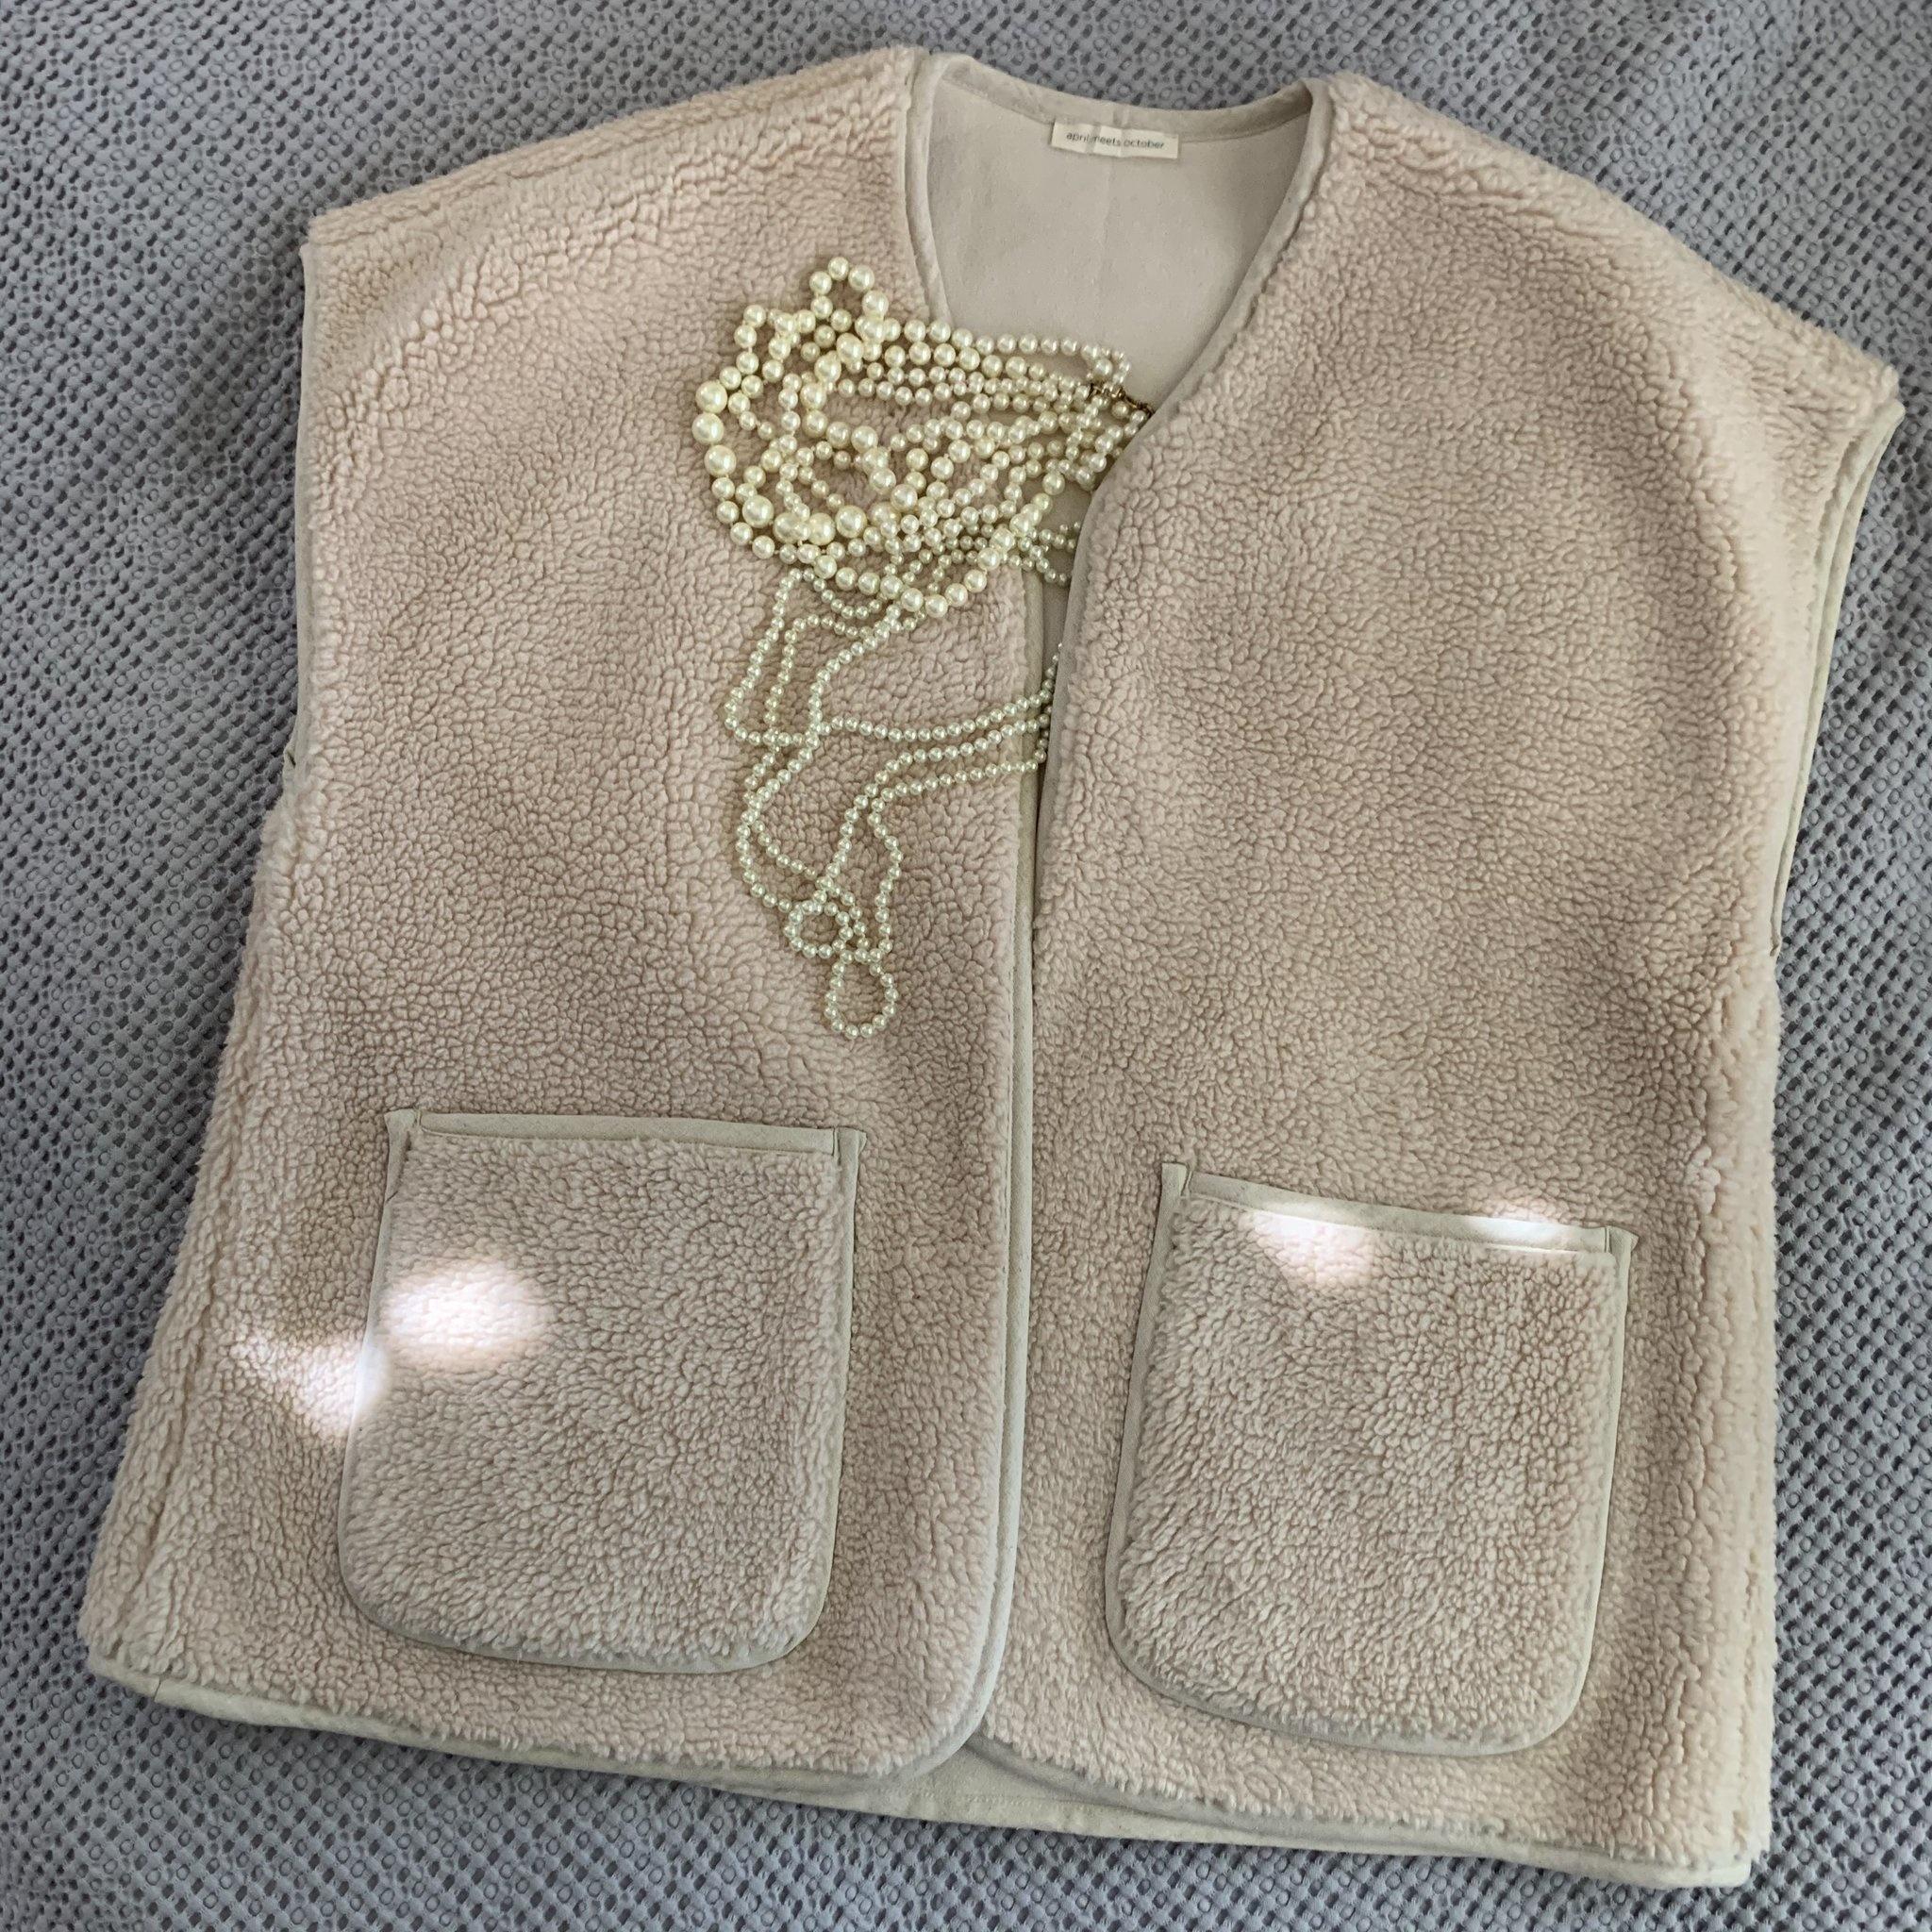 April Meets October November Vest, Oat, One Size Fits All